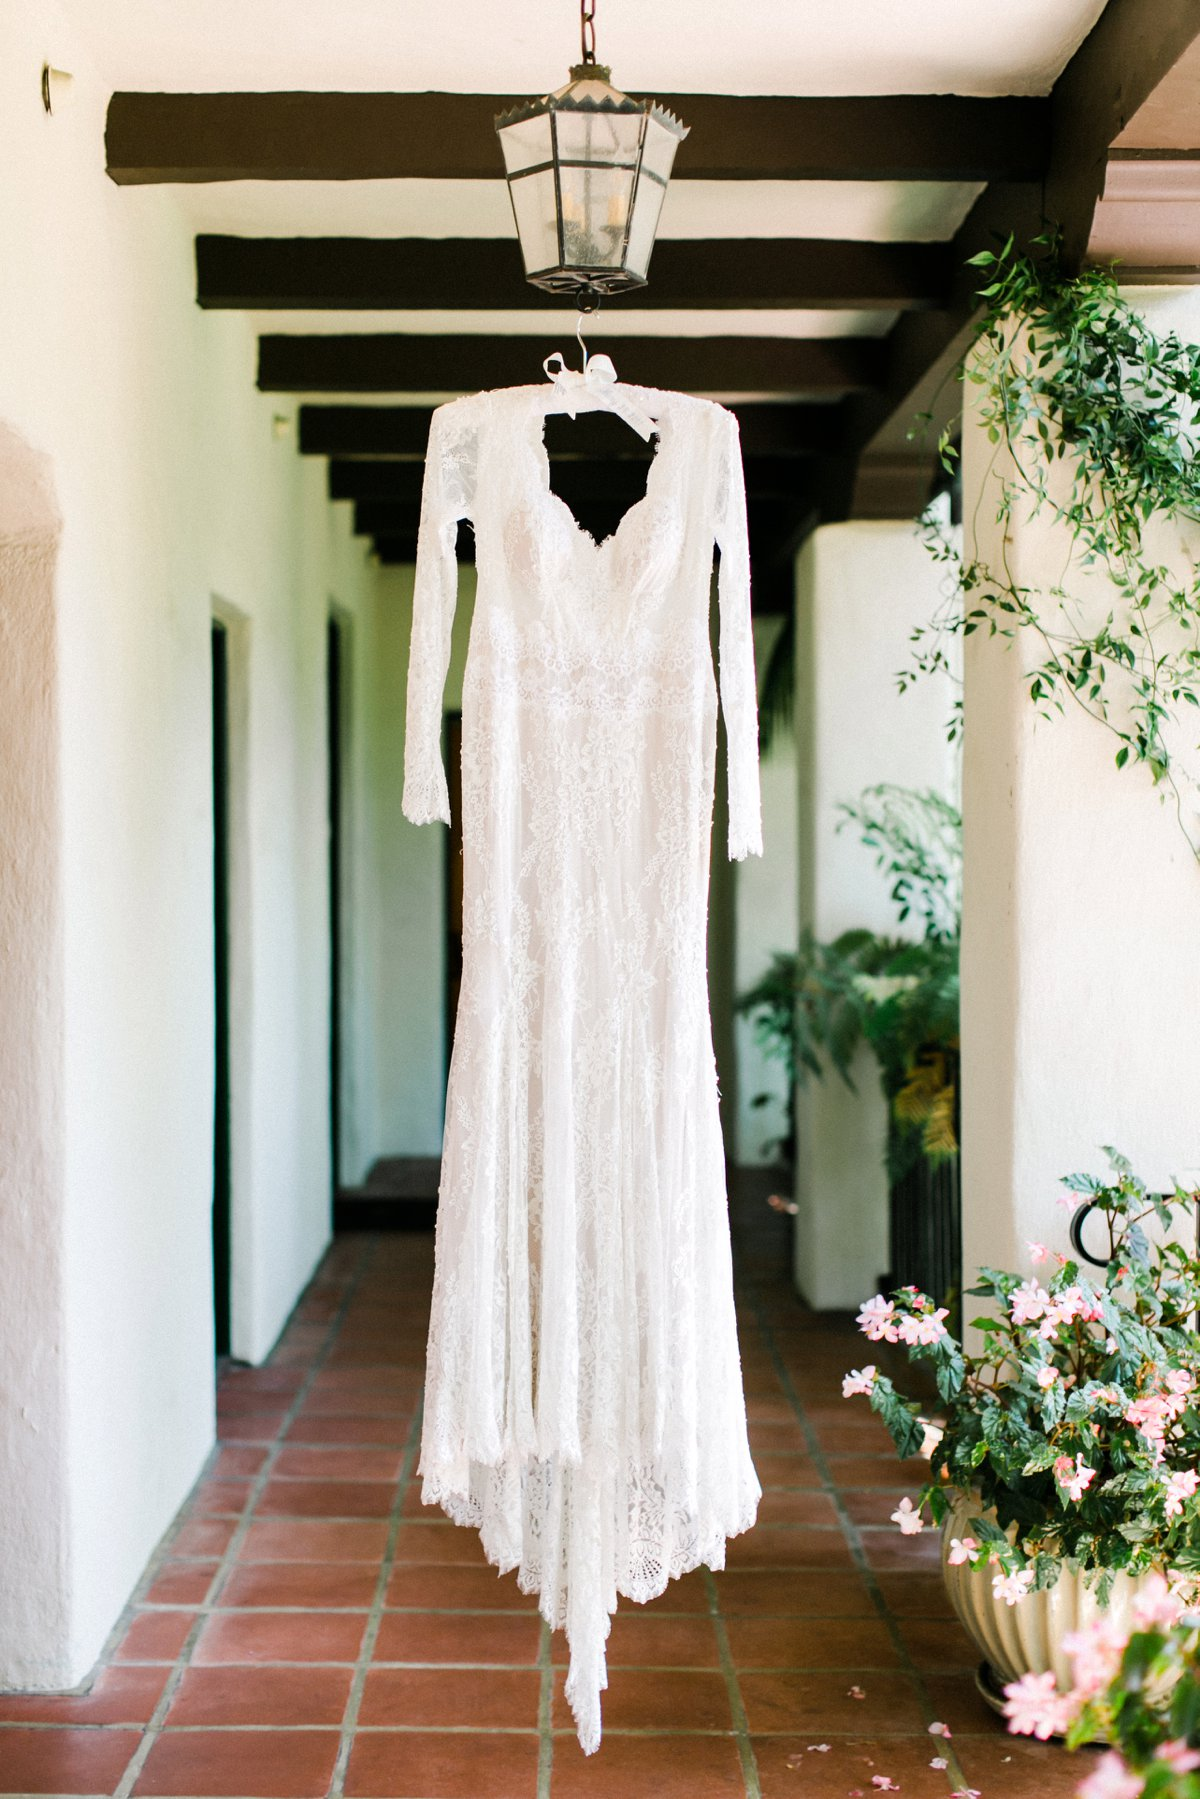 lace longsleeve wedding dresses - photo by Anna Delores http://ruffledblog.com/chic-modern-wedding-at-four-seasons-santa-barbara